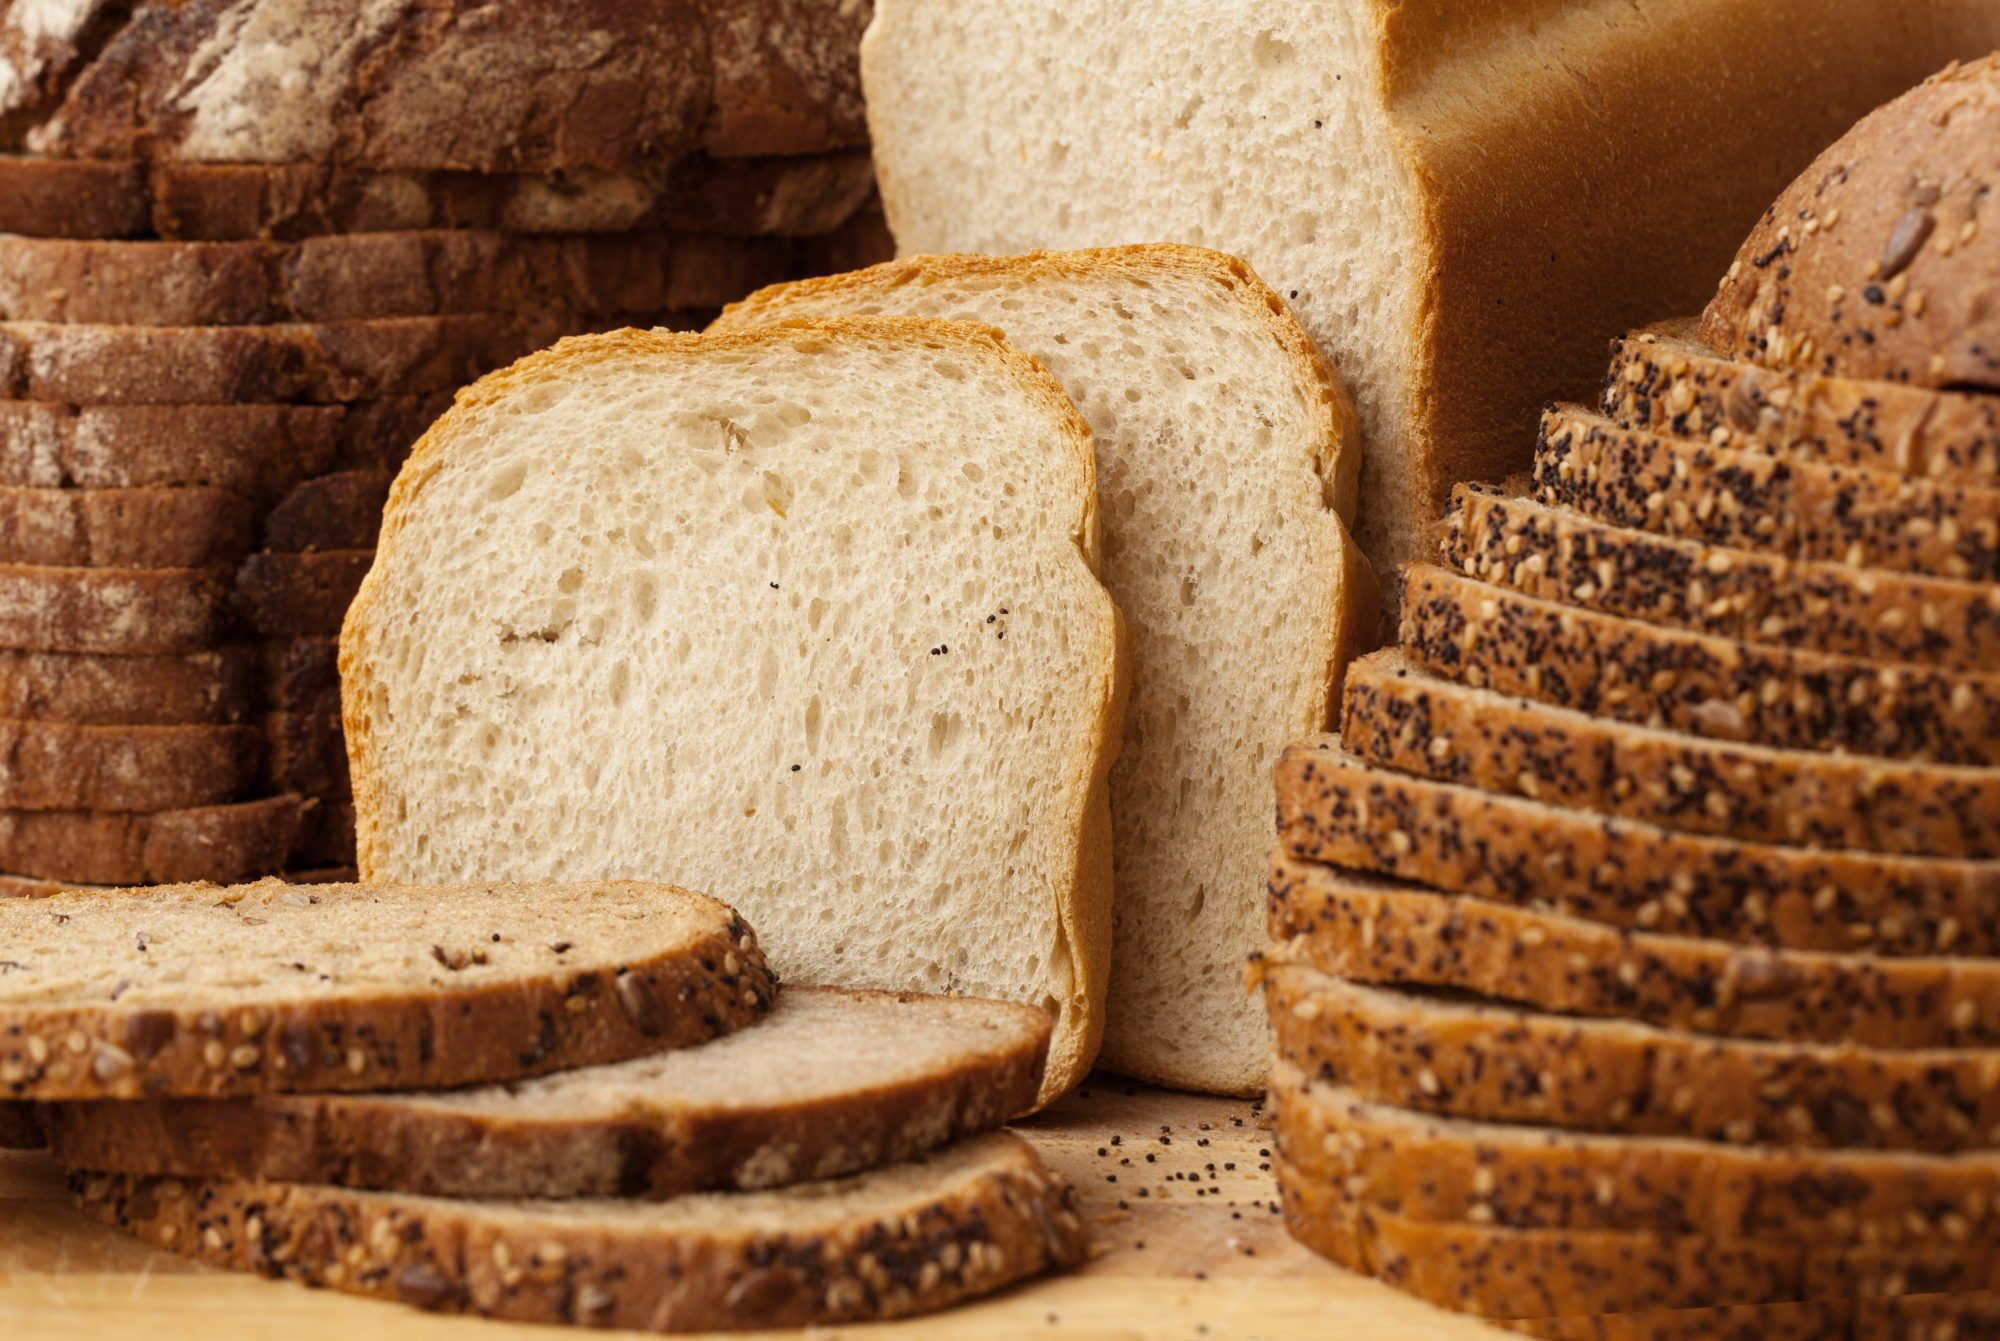 Sliced bread 1 Getty 7/7/20